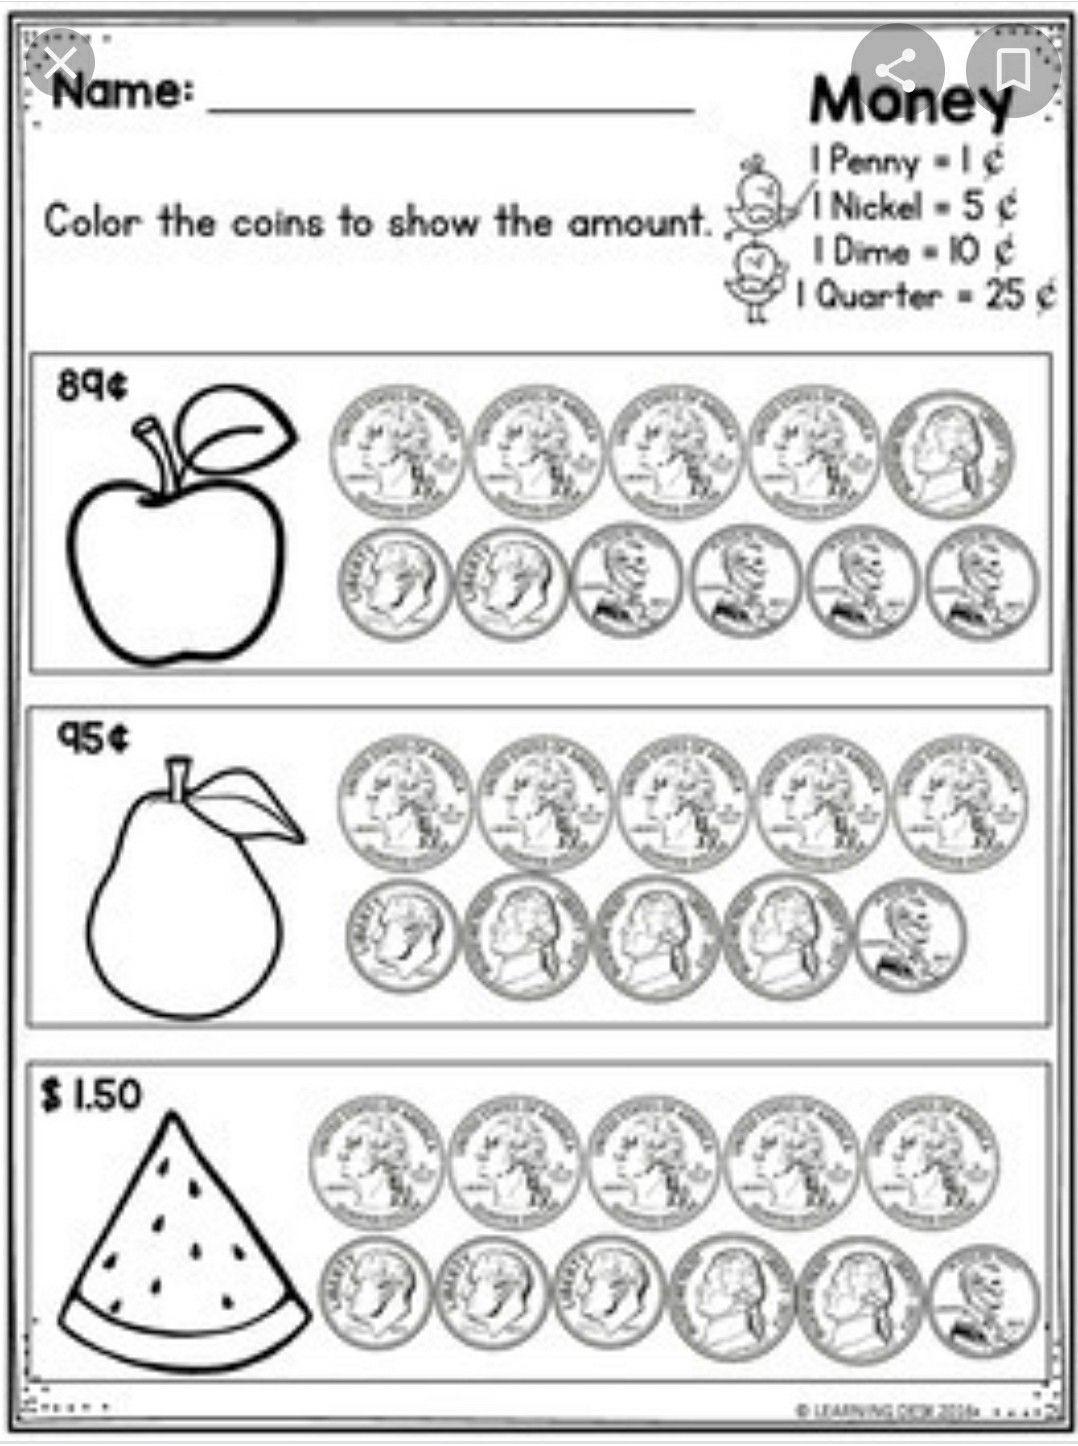 Pin By Jan Tanega On Math Worksheets In 2020 Money Worksheets Counting Money Worksheets Counting Coins Worksheet